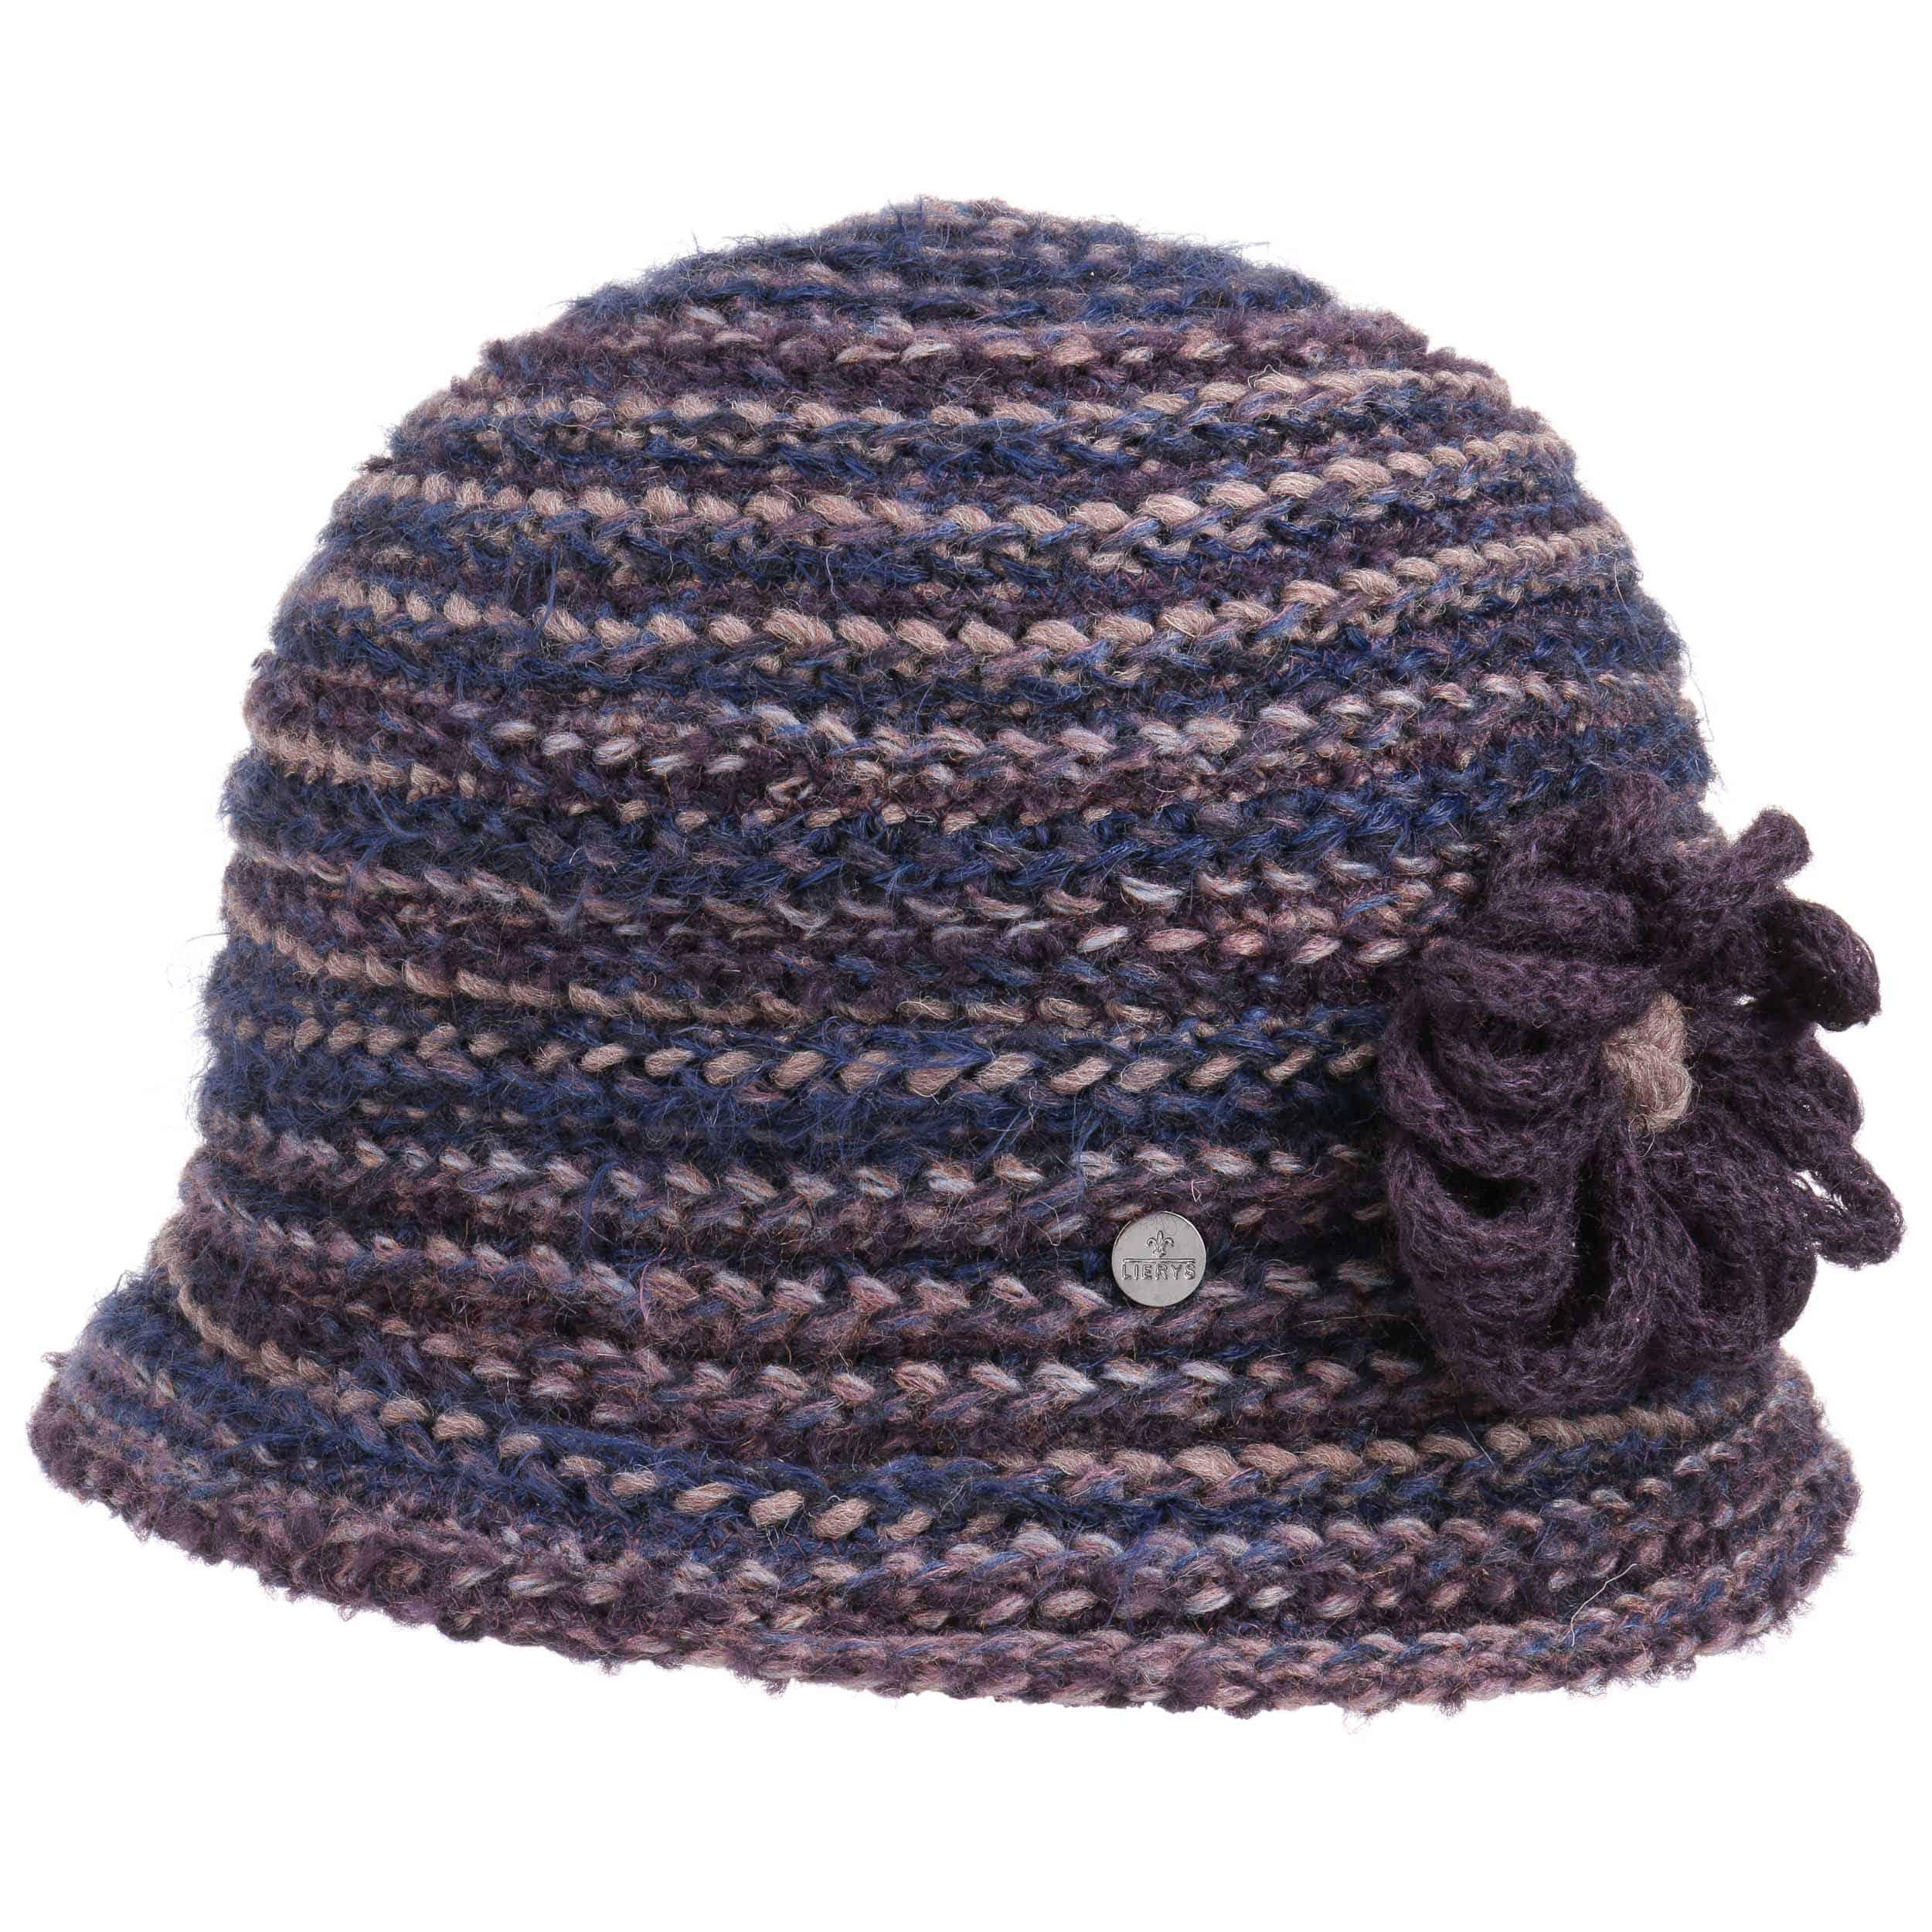 347ef4c31a5 ... Multicolour Knit Hat with Flower by Lierys - purple 6